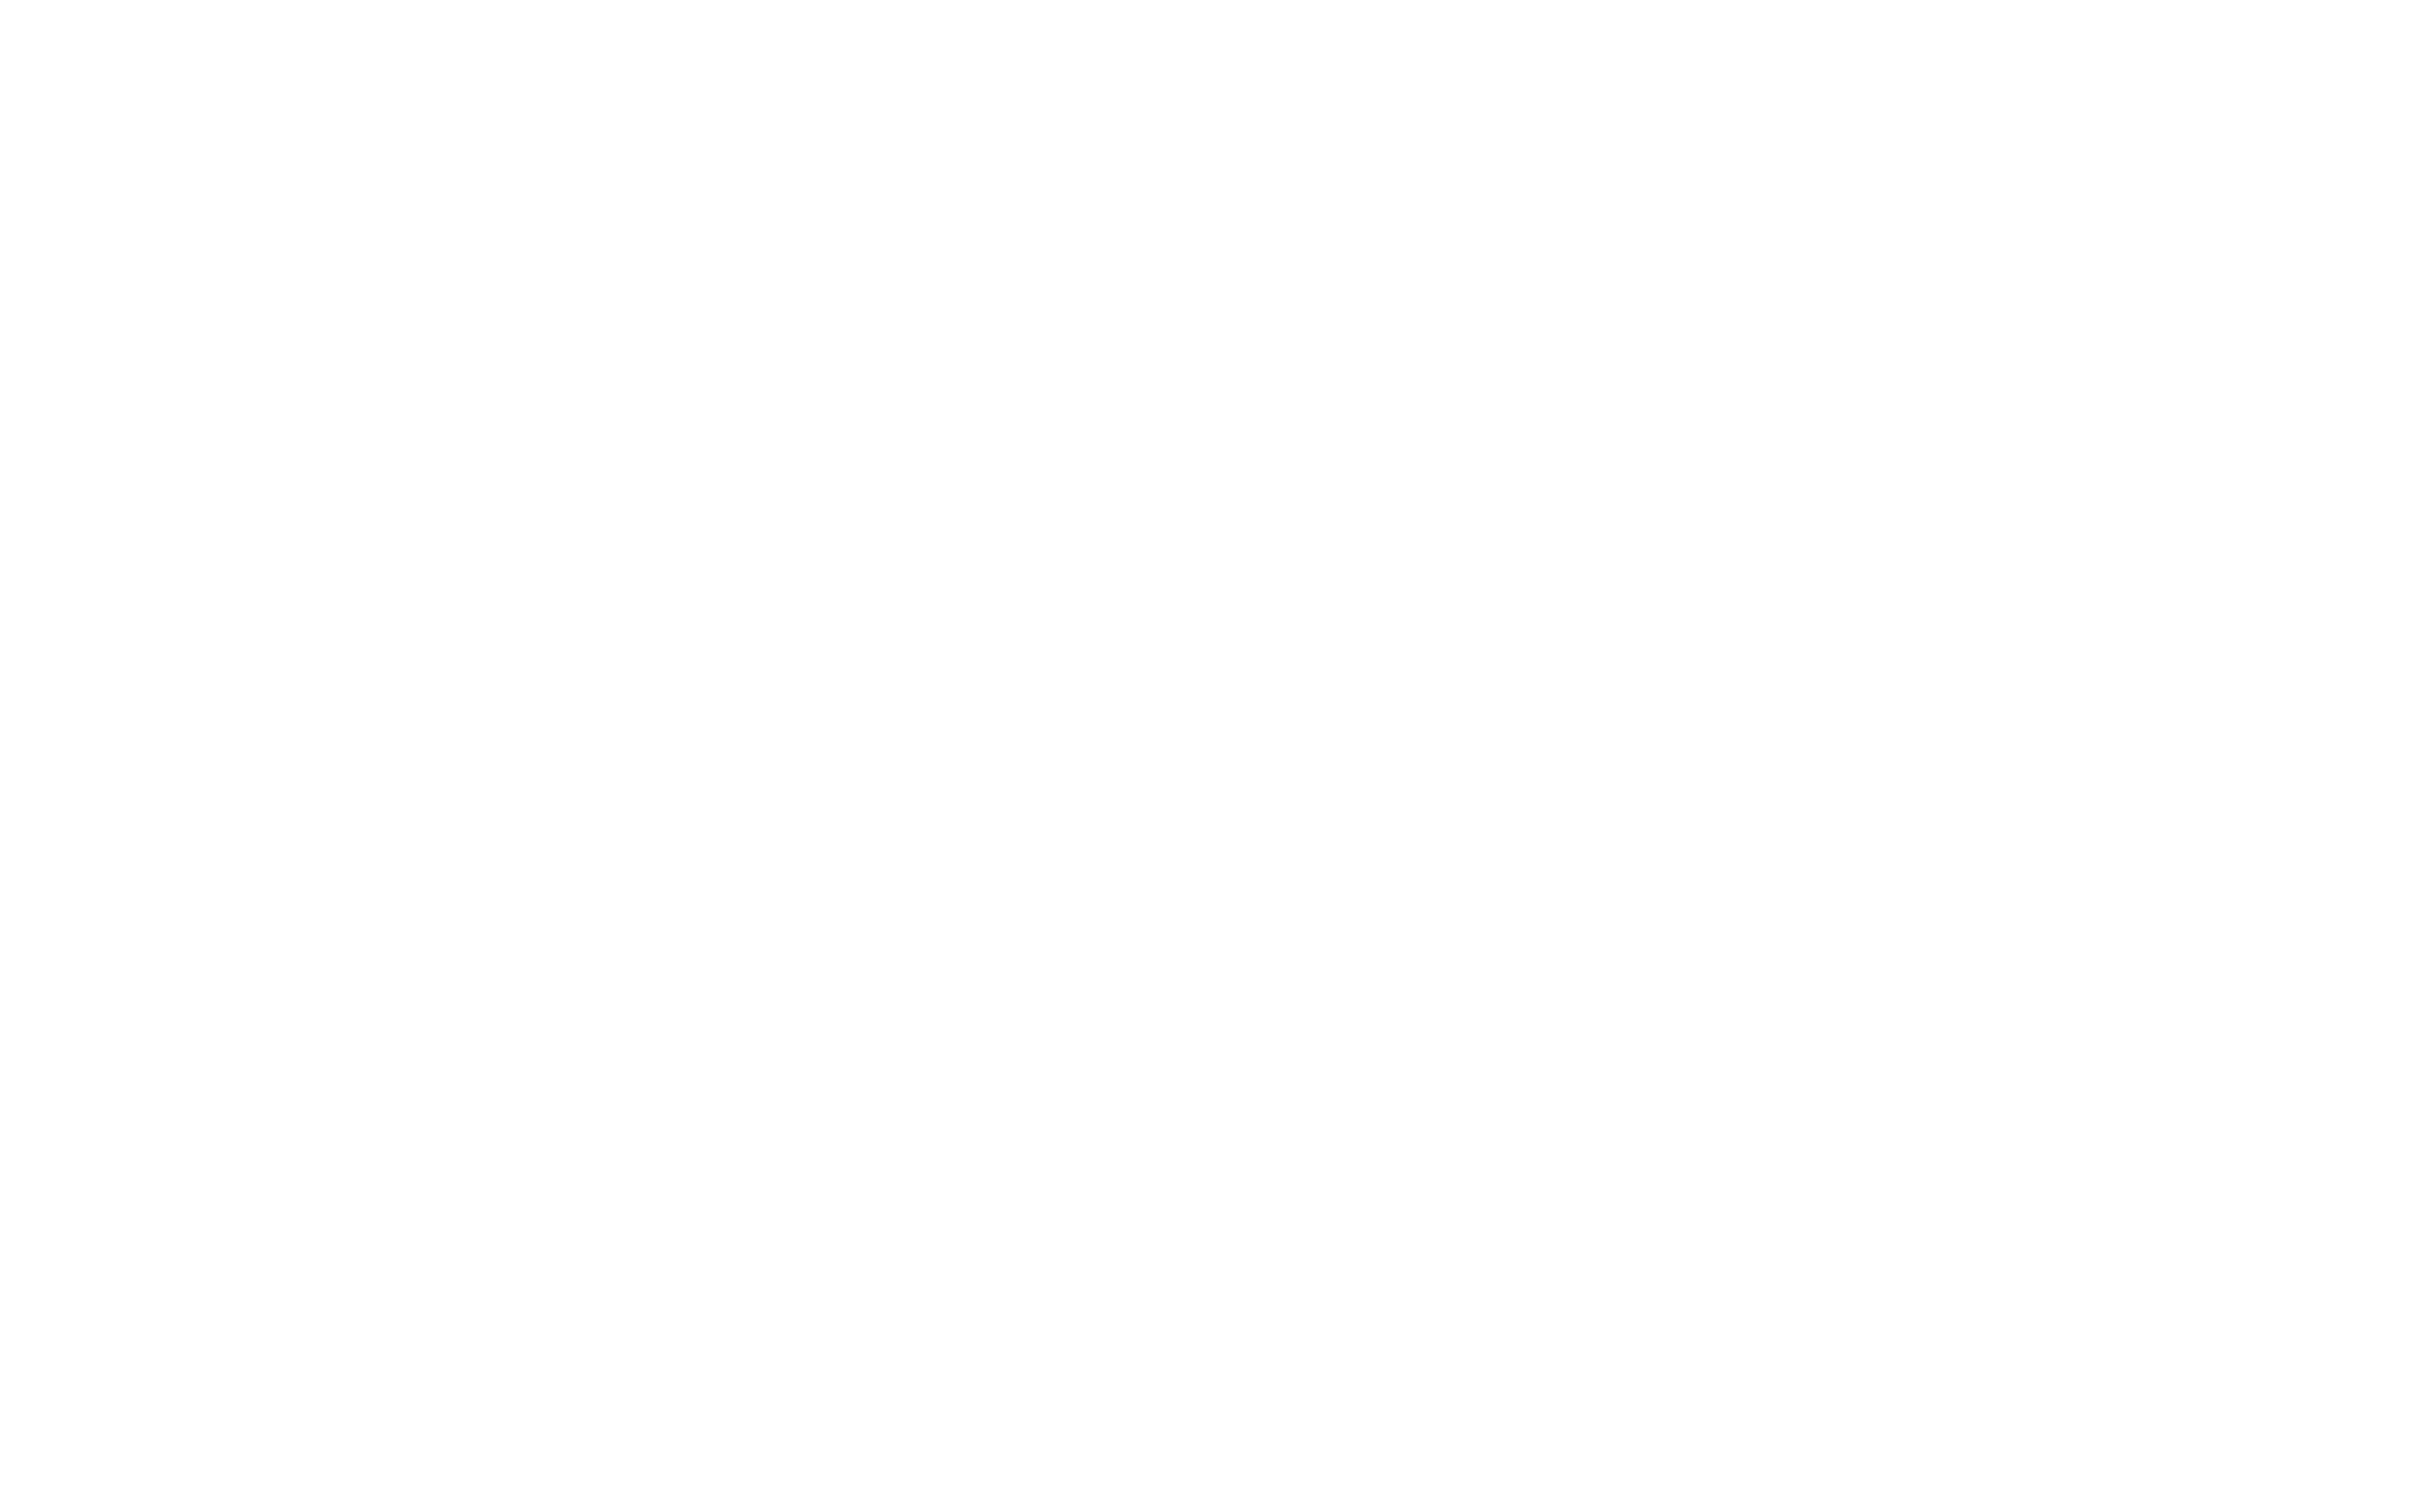 Maxime LEBORGNE